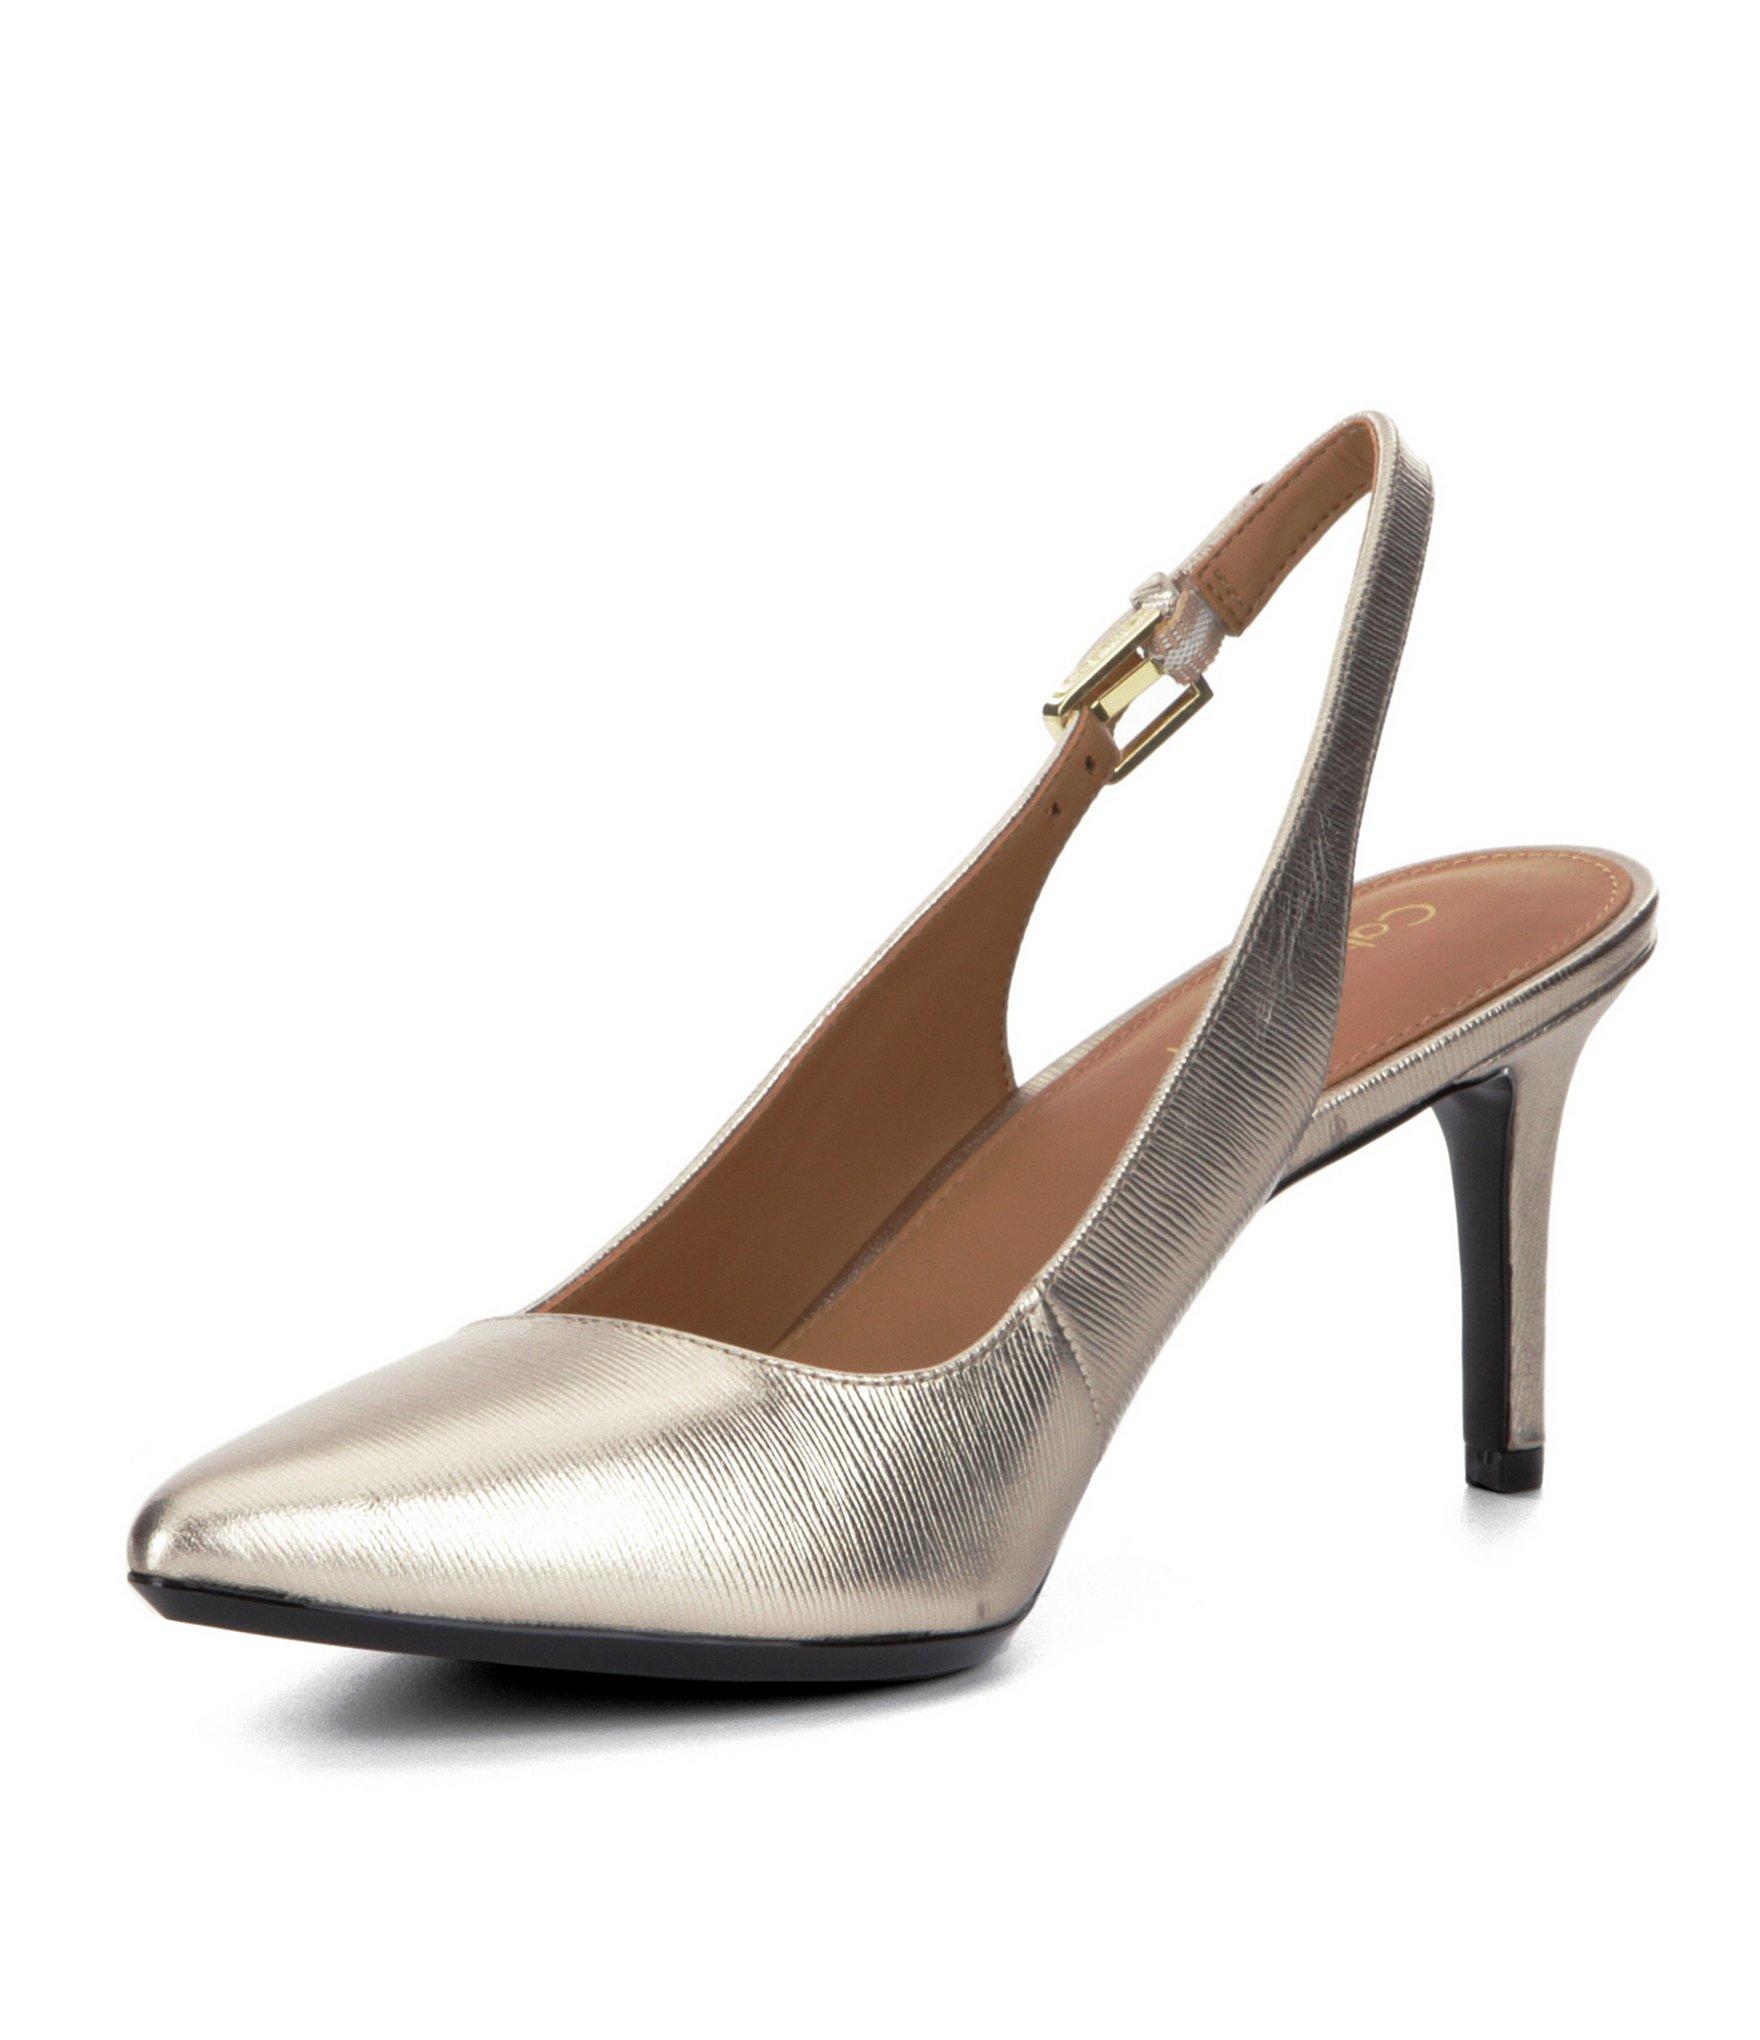 2de7e552b5a Lyst - Calvin Klein Giovanna Metallic Leather Slingback Pumps in ...